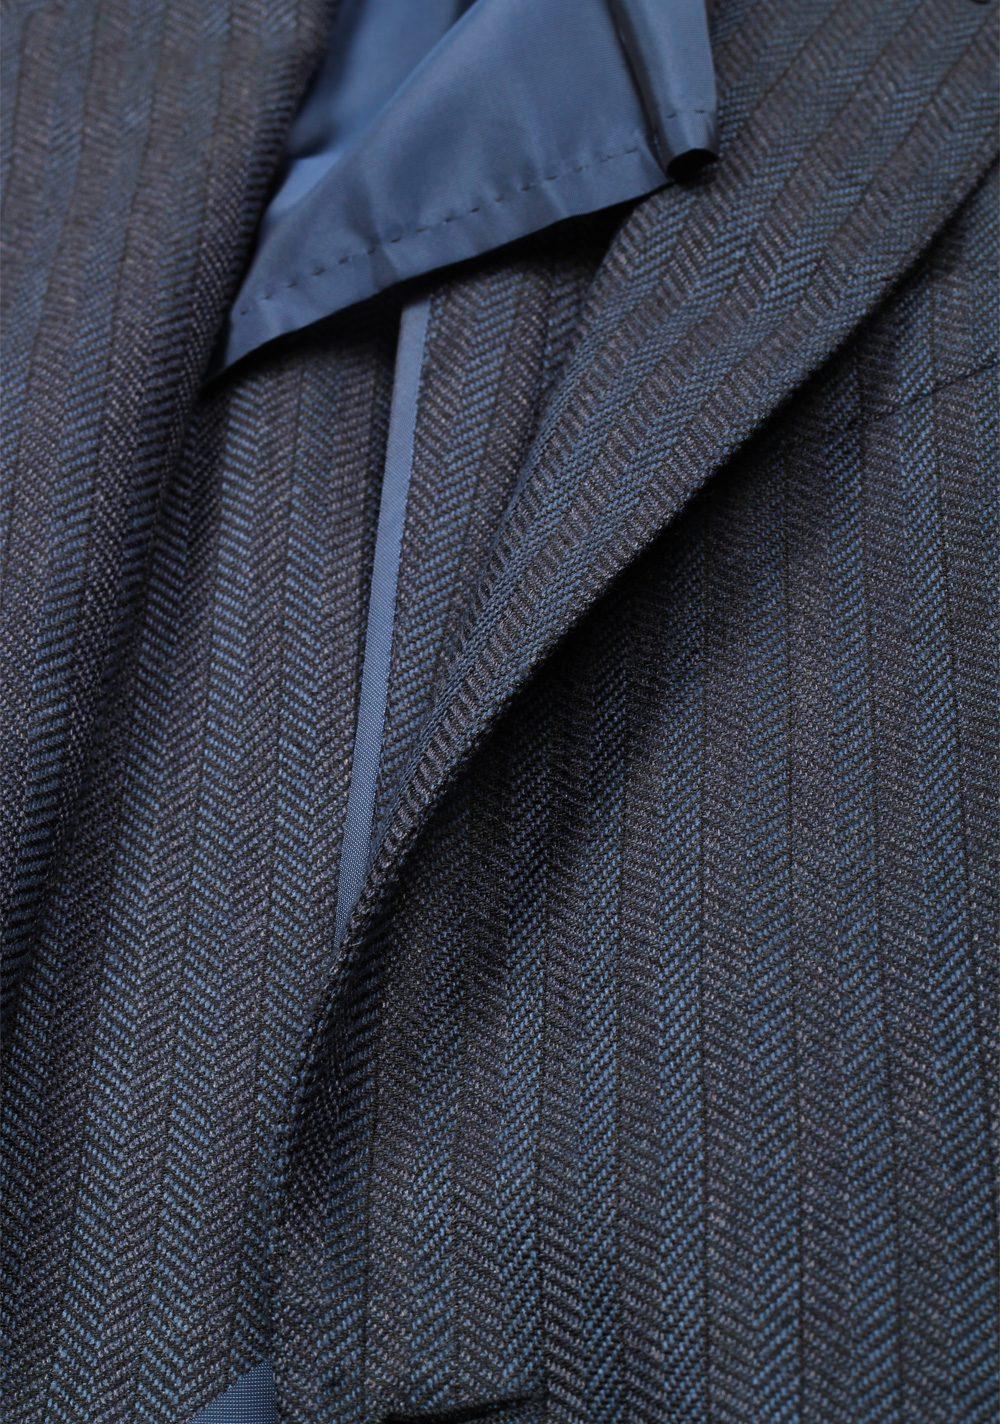 TOM FORD Buckley Blue Sport Coat Size 48 / 38R U.S. Base E   Costume Limité